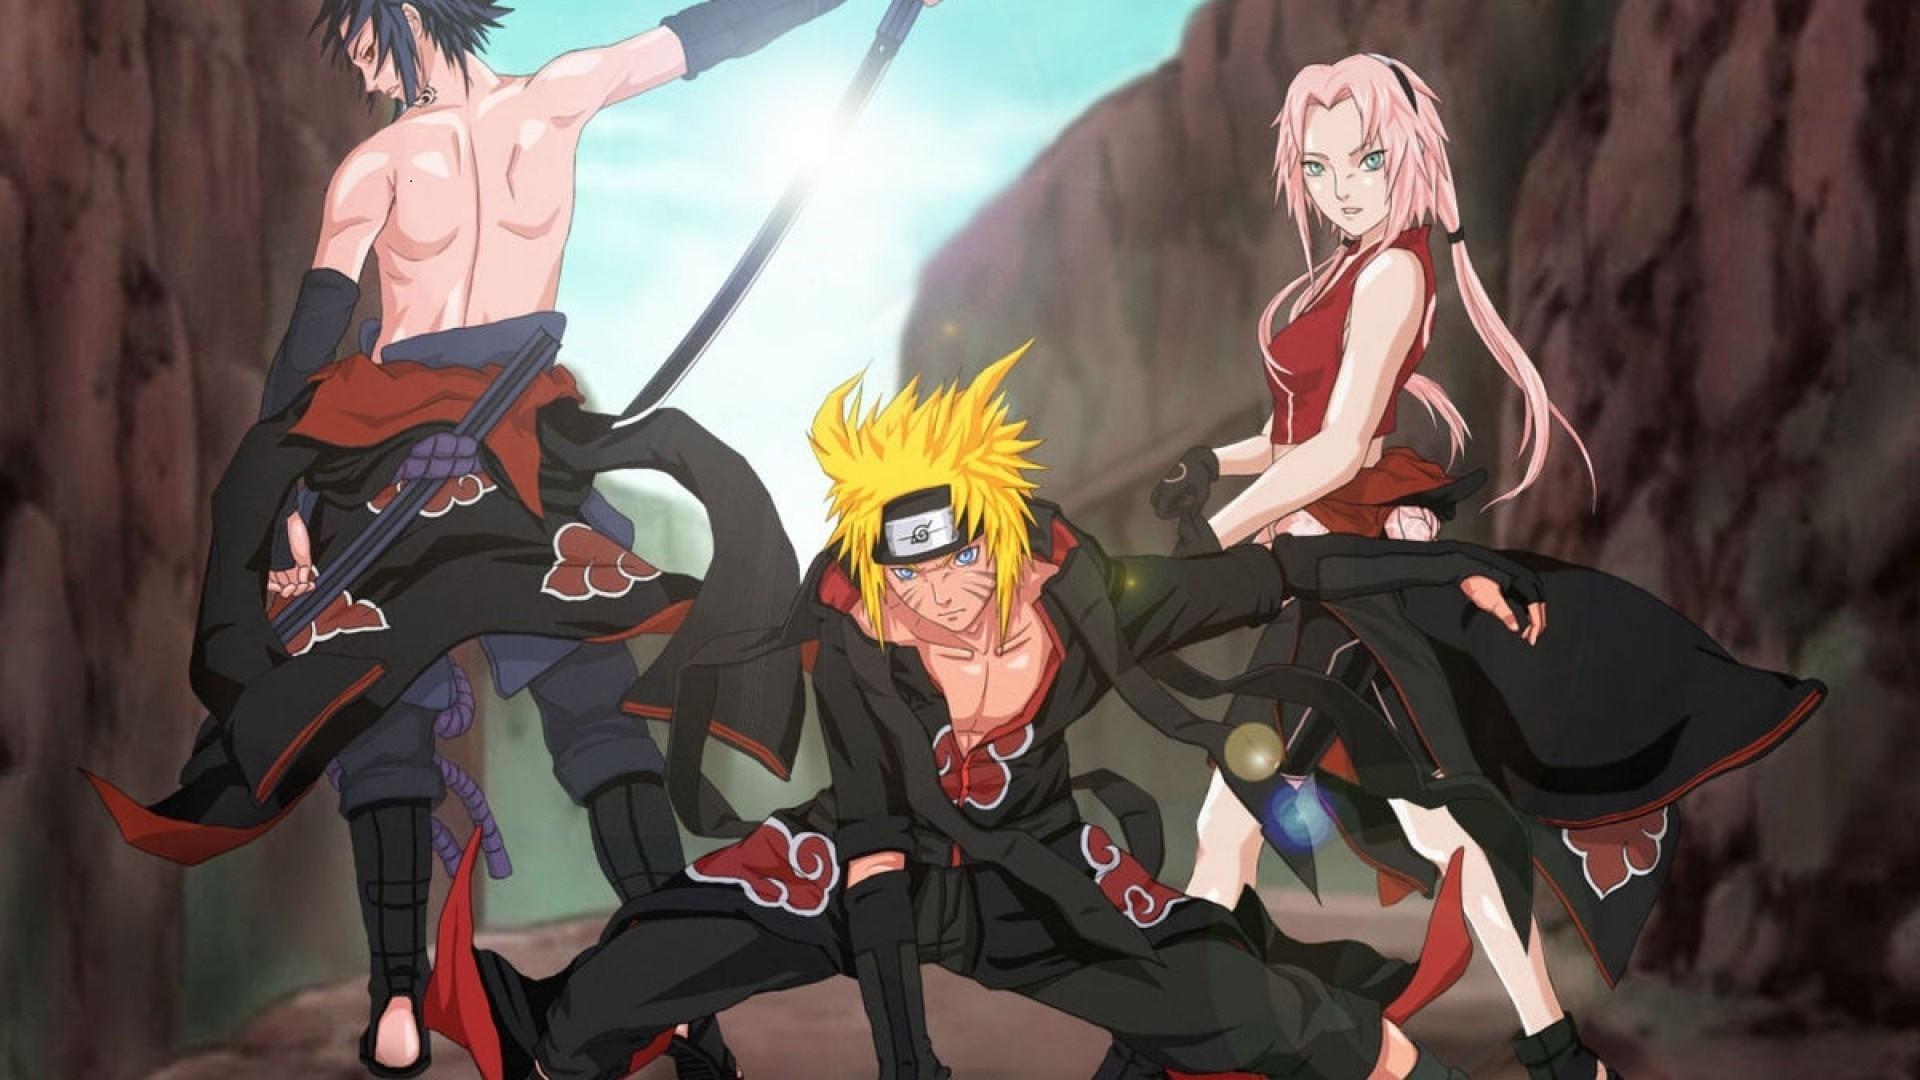 Top Wallpaper Naruto Supreme - 1105037-widescreen-naruto-team-7-wallpapers-1920x1080  Picture.jpg